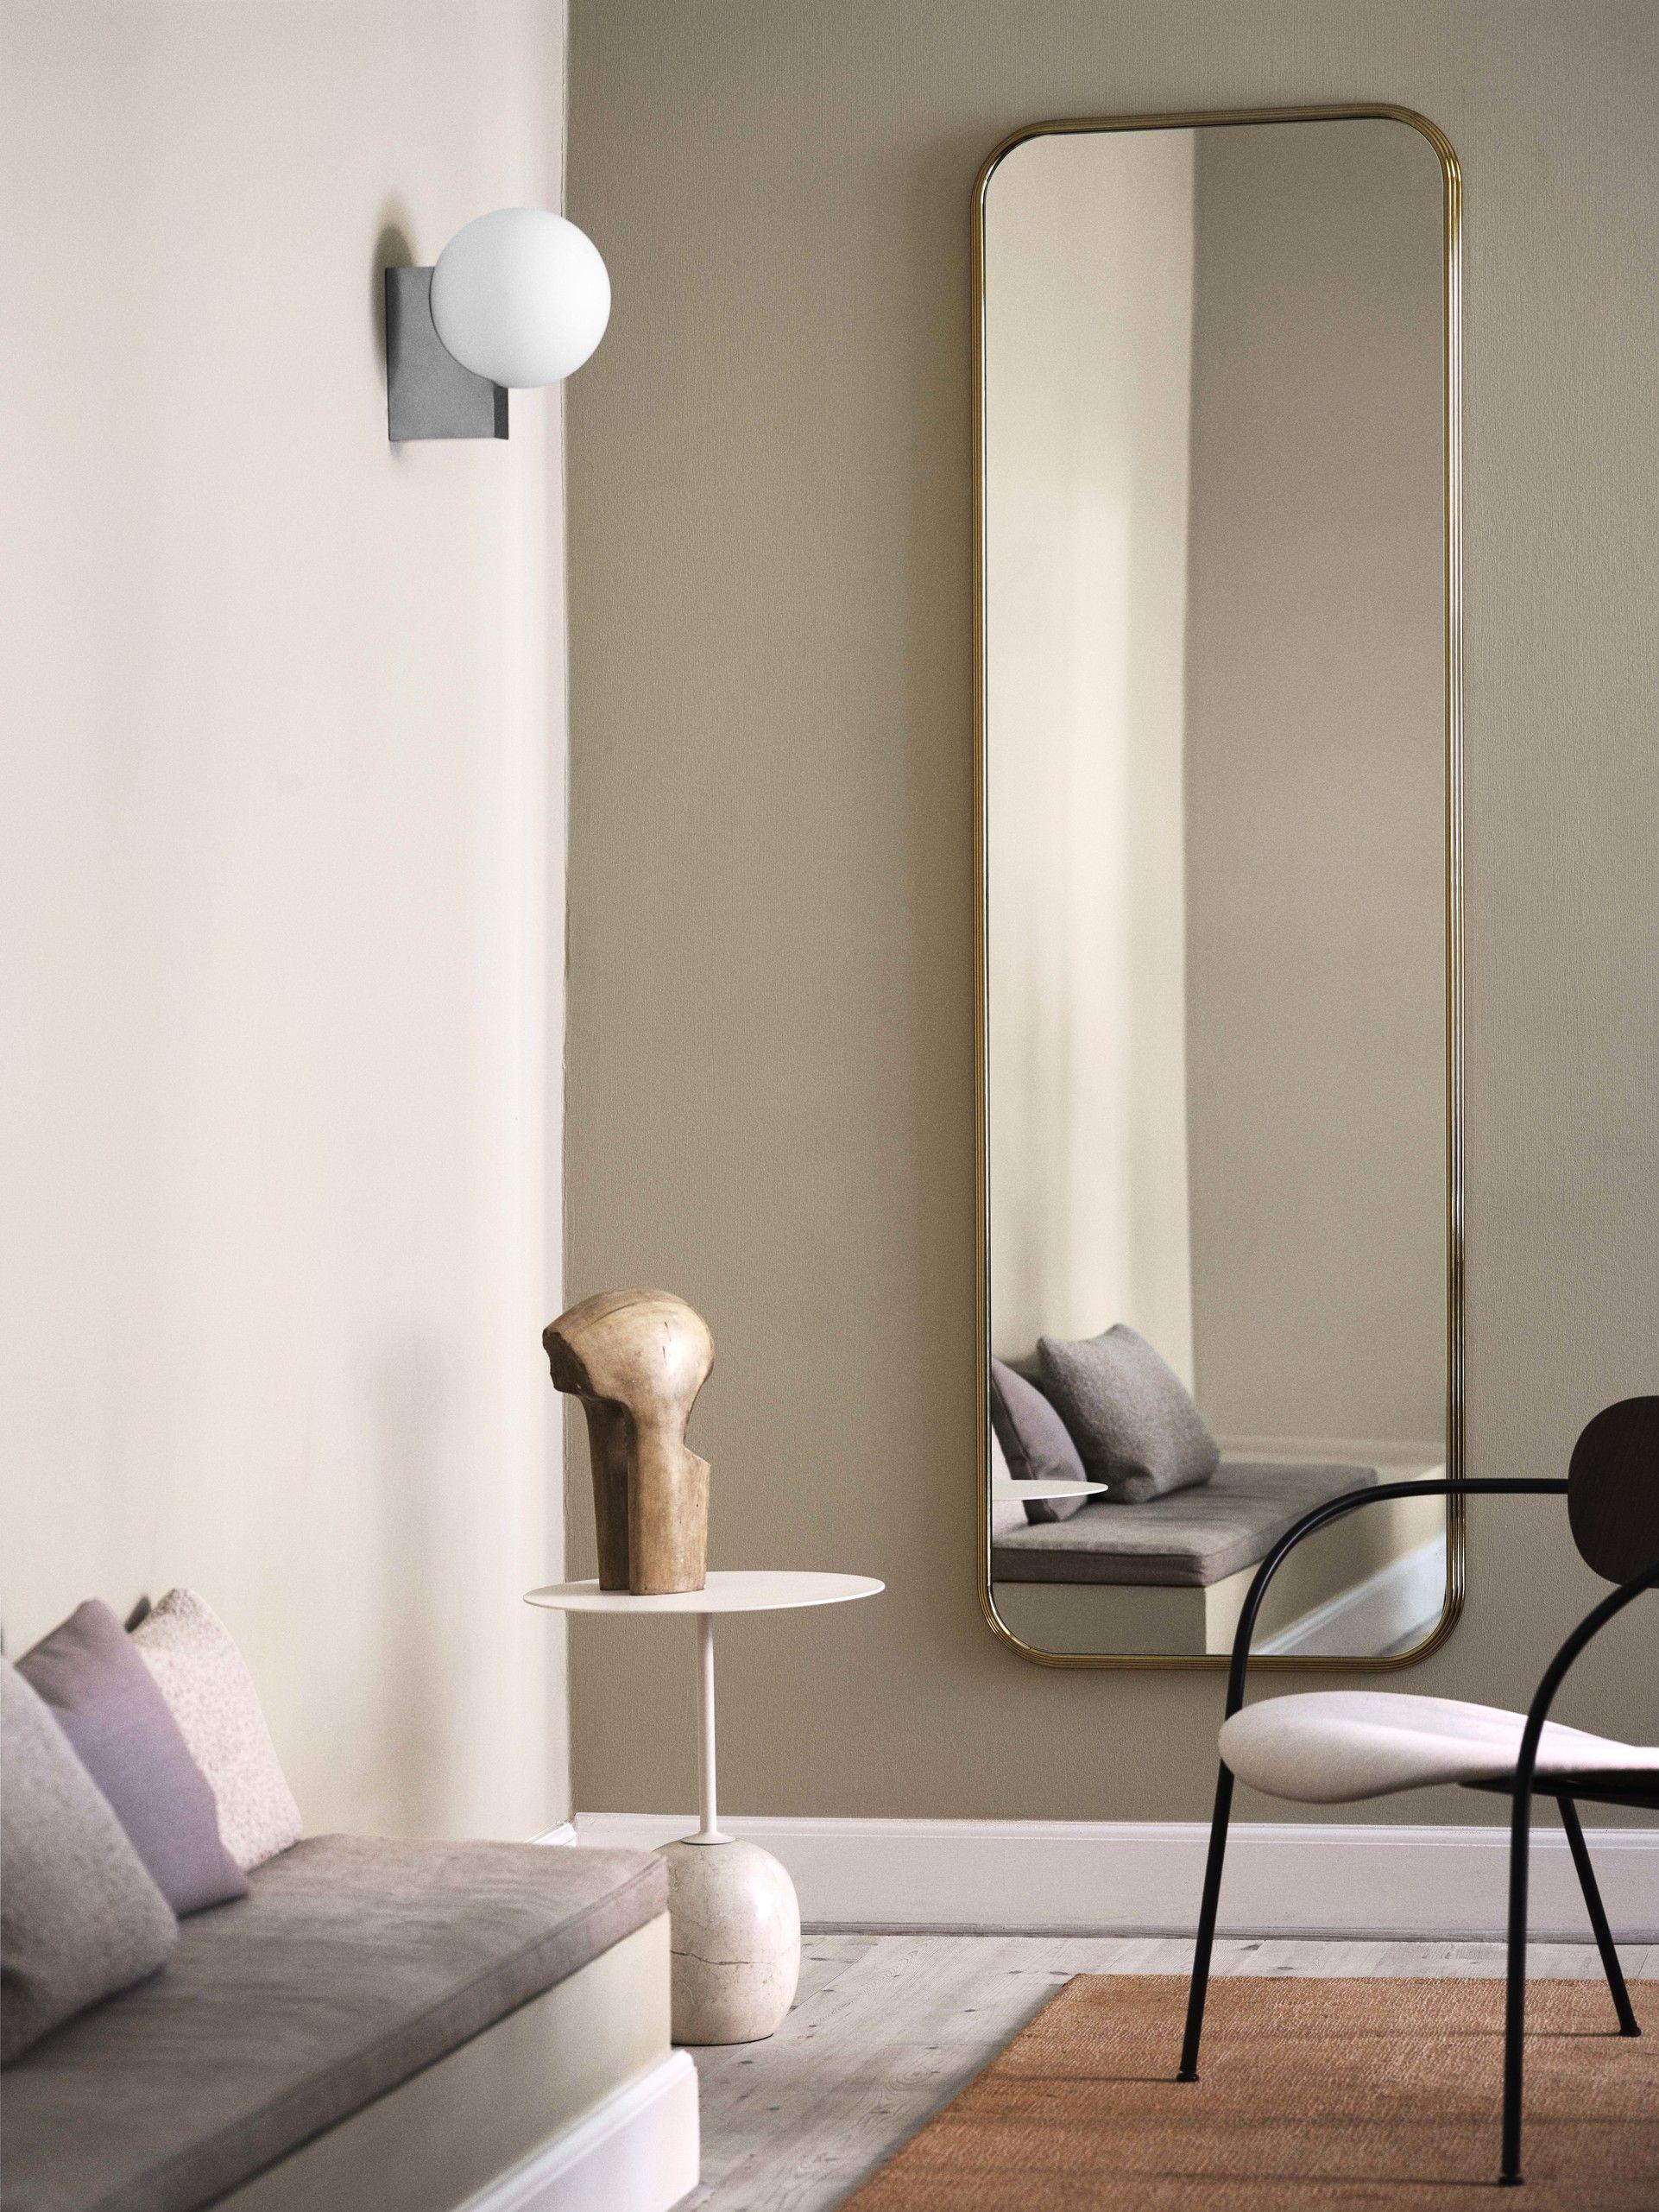 Sillon Mirror Sh7 By Sebastian Herkner Pavilion Chair Av6 By Anderssen Voll Journey Lamp Shy2 By Signe Hytte L Furniture Design Pavilion Chair Mirror Wall